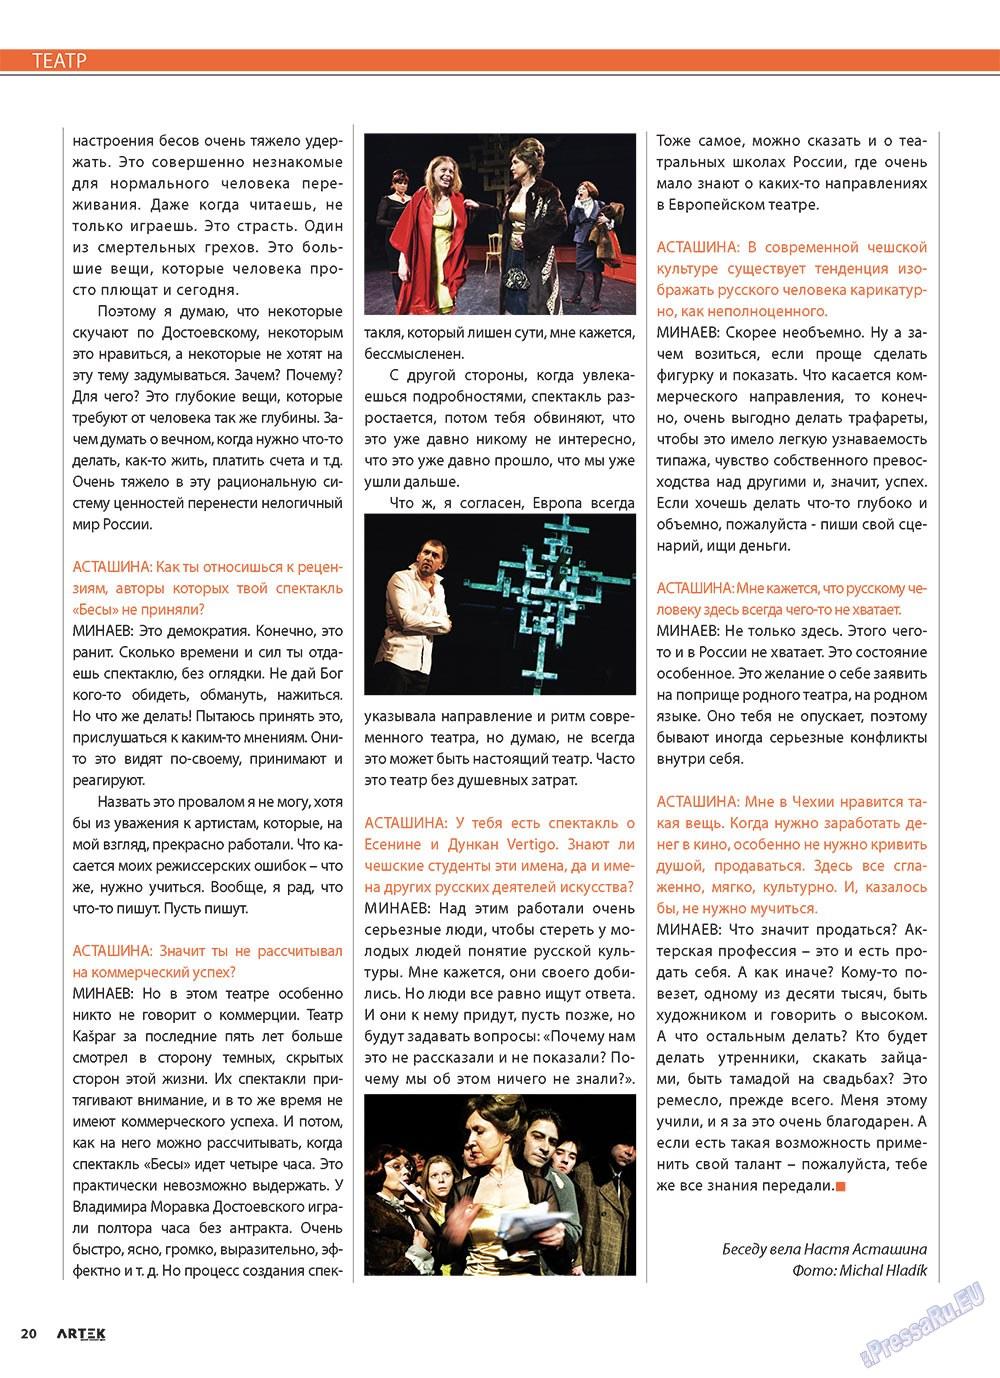 Артек (журнал). 2010 год, номер 4, стр. 22